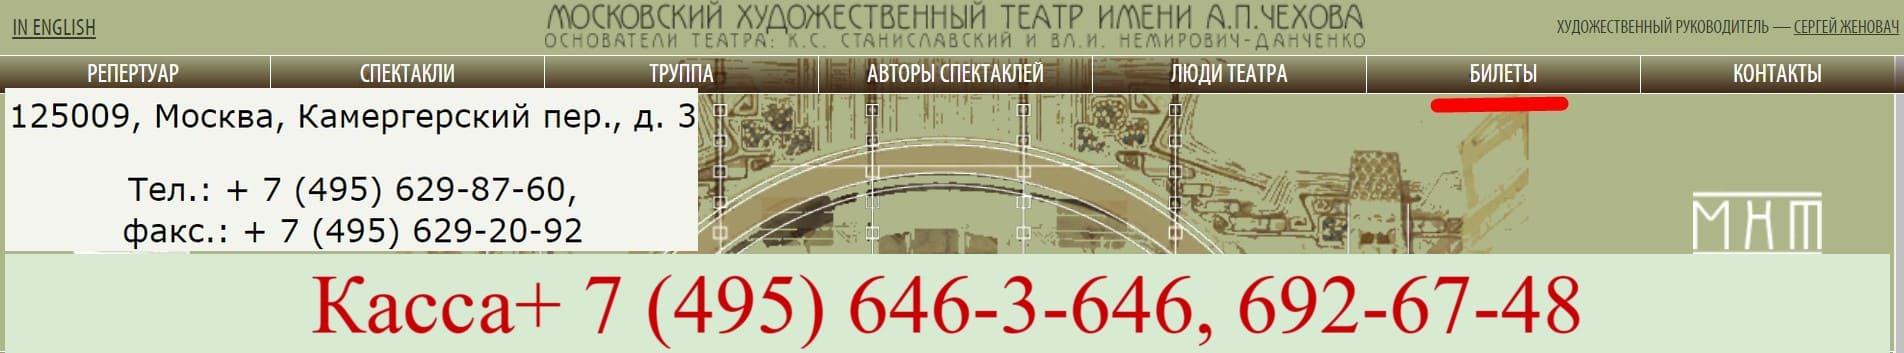 Сайт МХТ Чехова